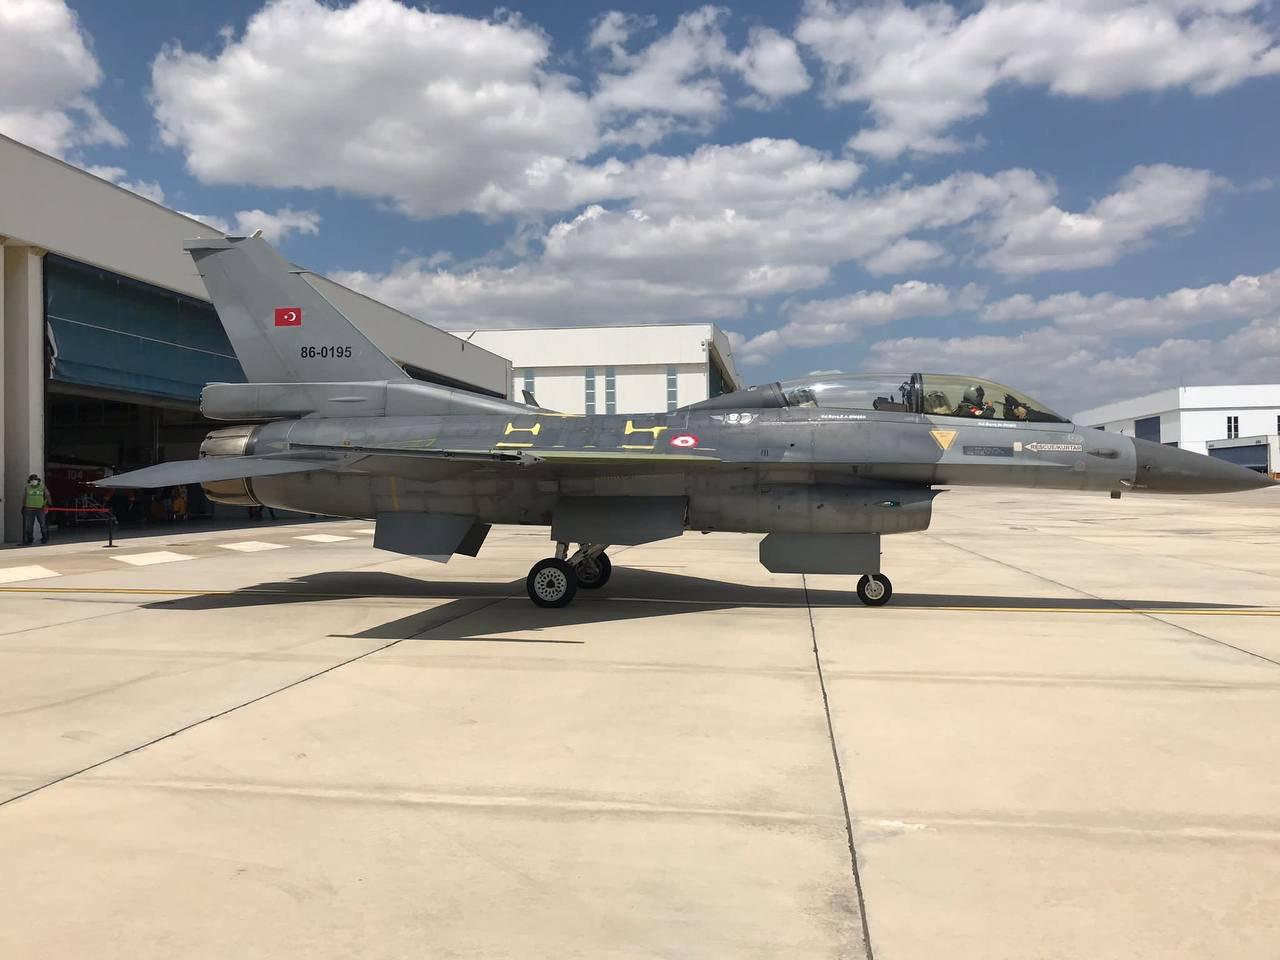 Turkish Aerospace Industries Launches F-16 Block 30 Life-extension Program